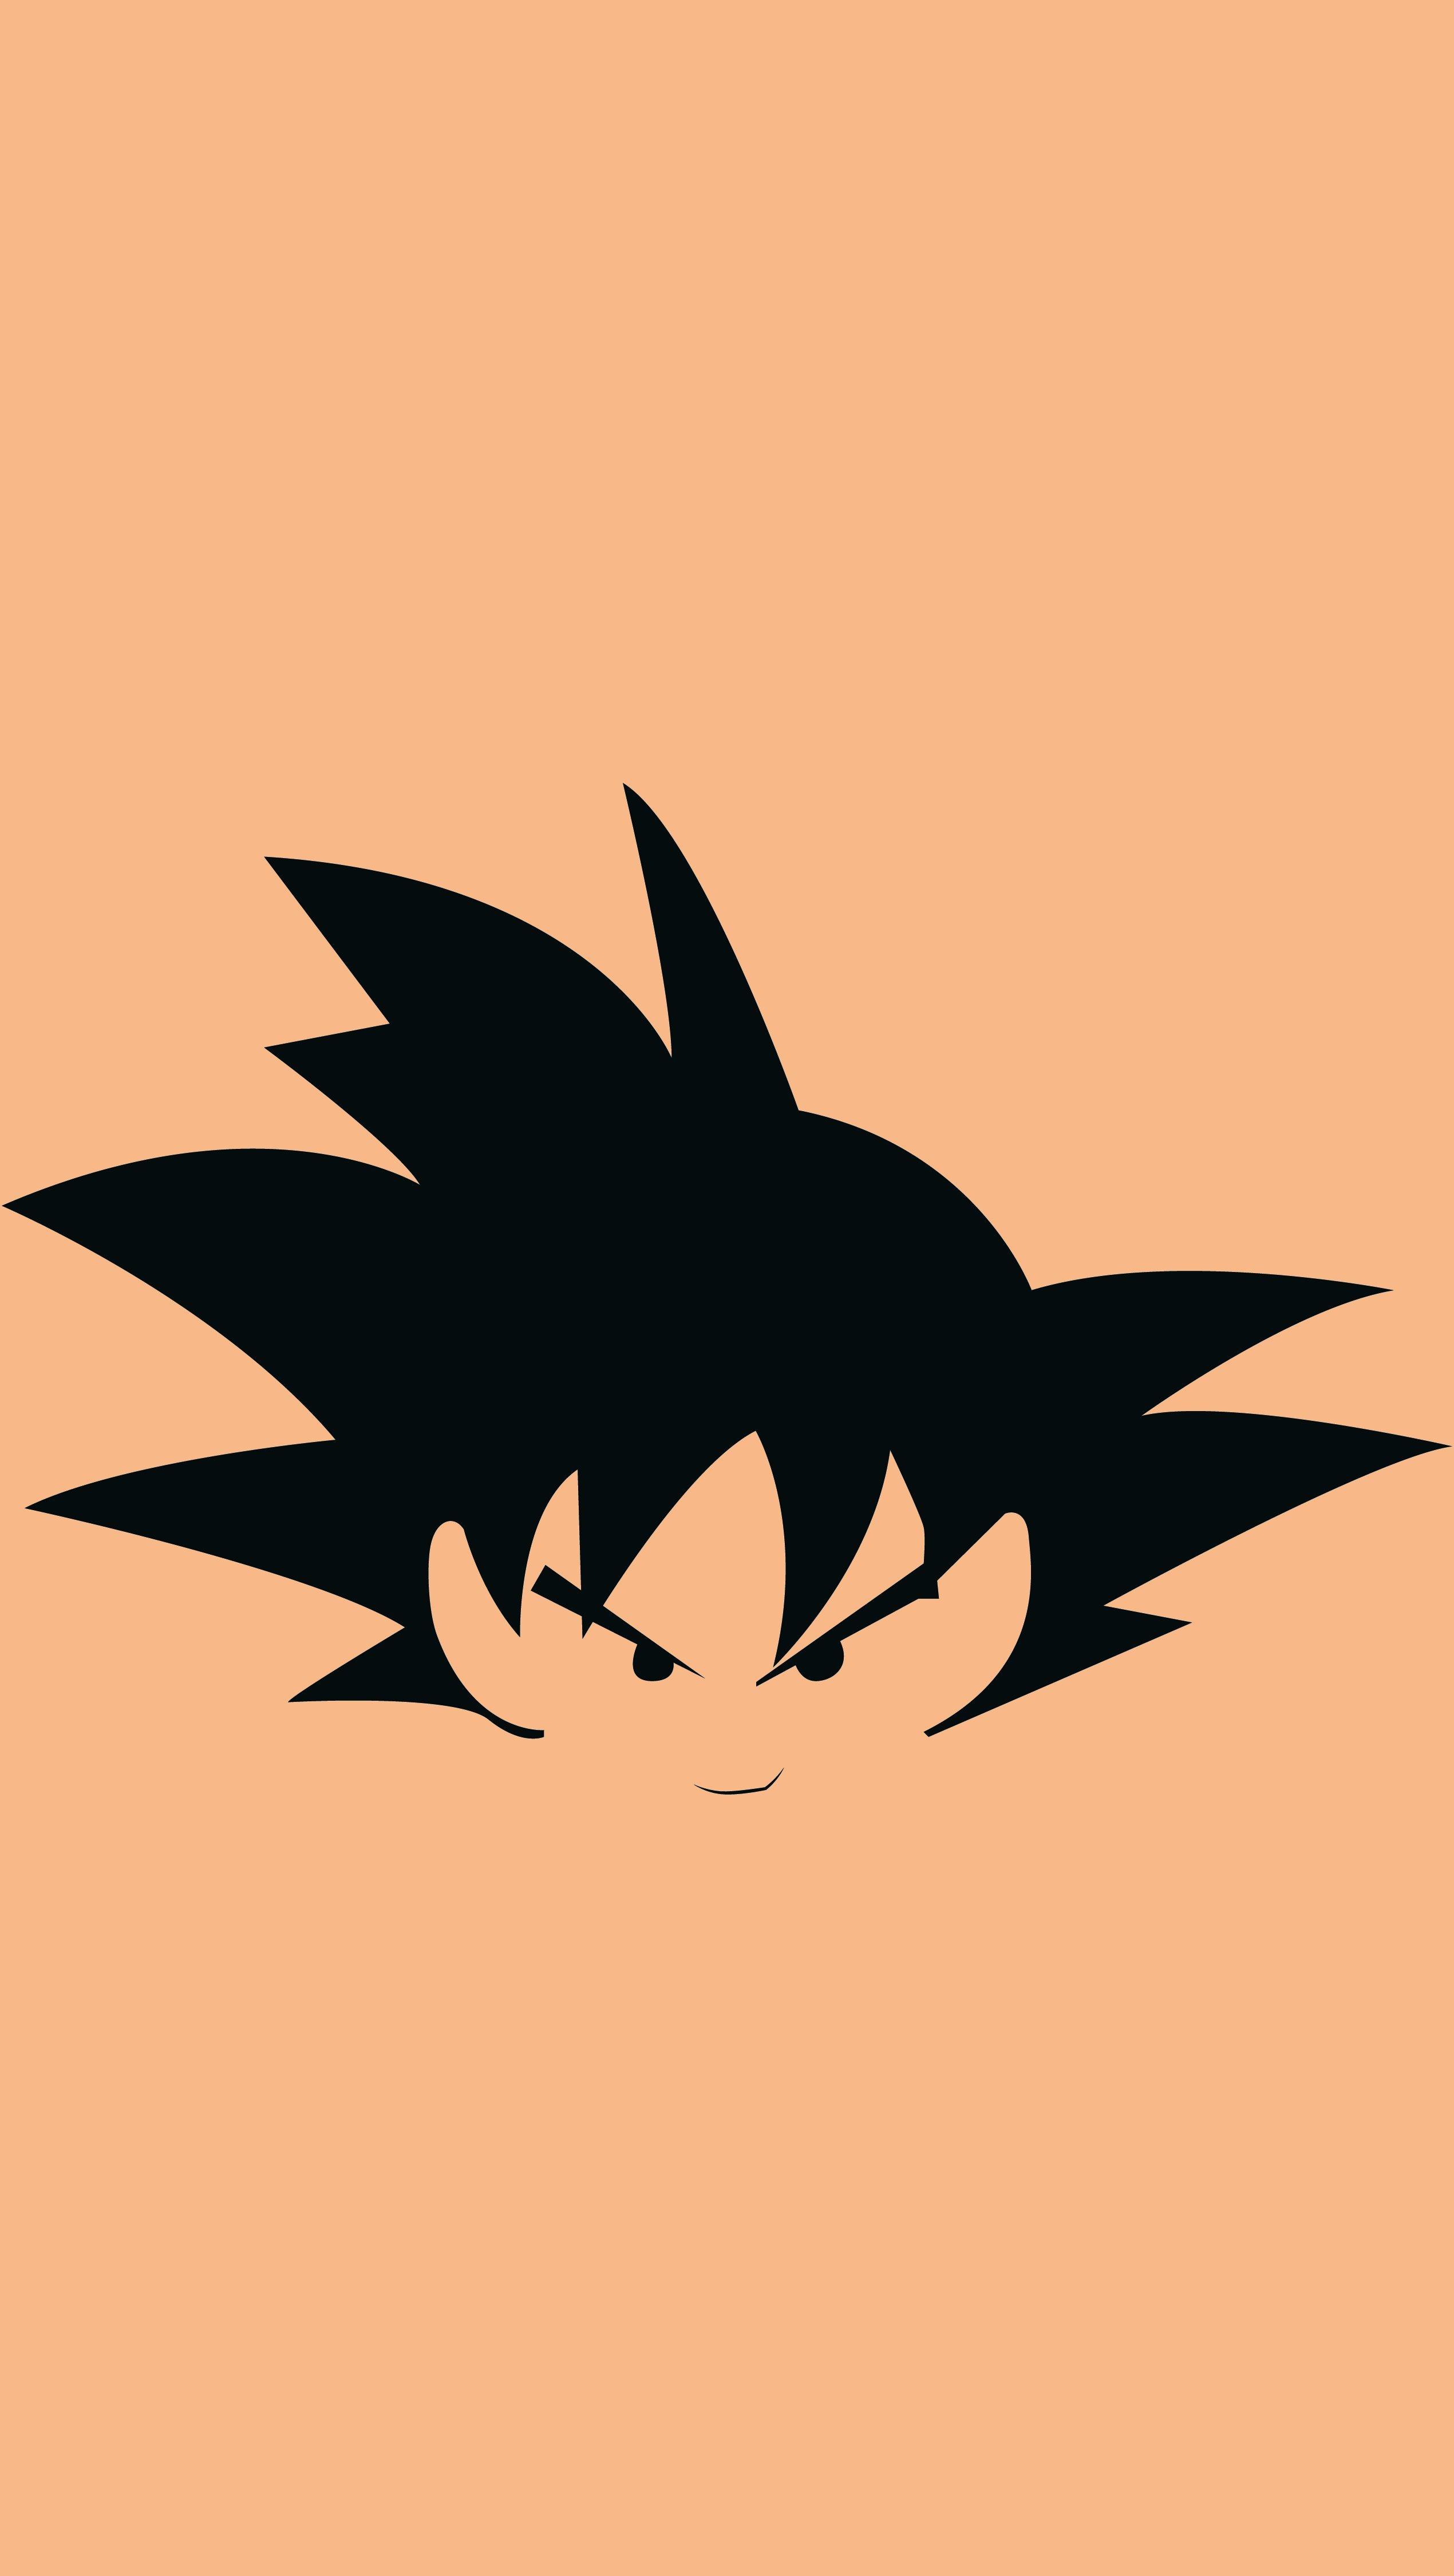 Fondos de pantalla Anime Ilustración minimalista de Goku Vertical